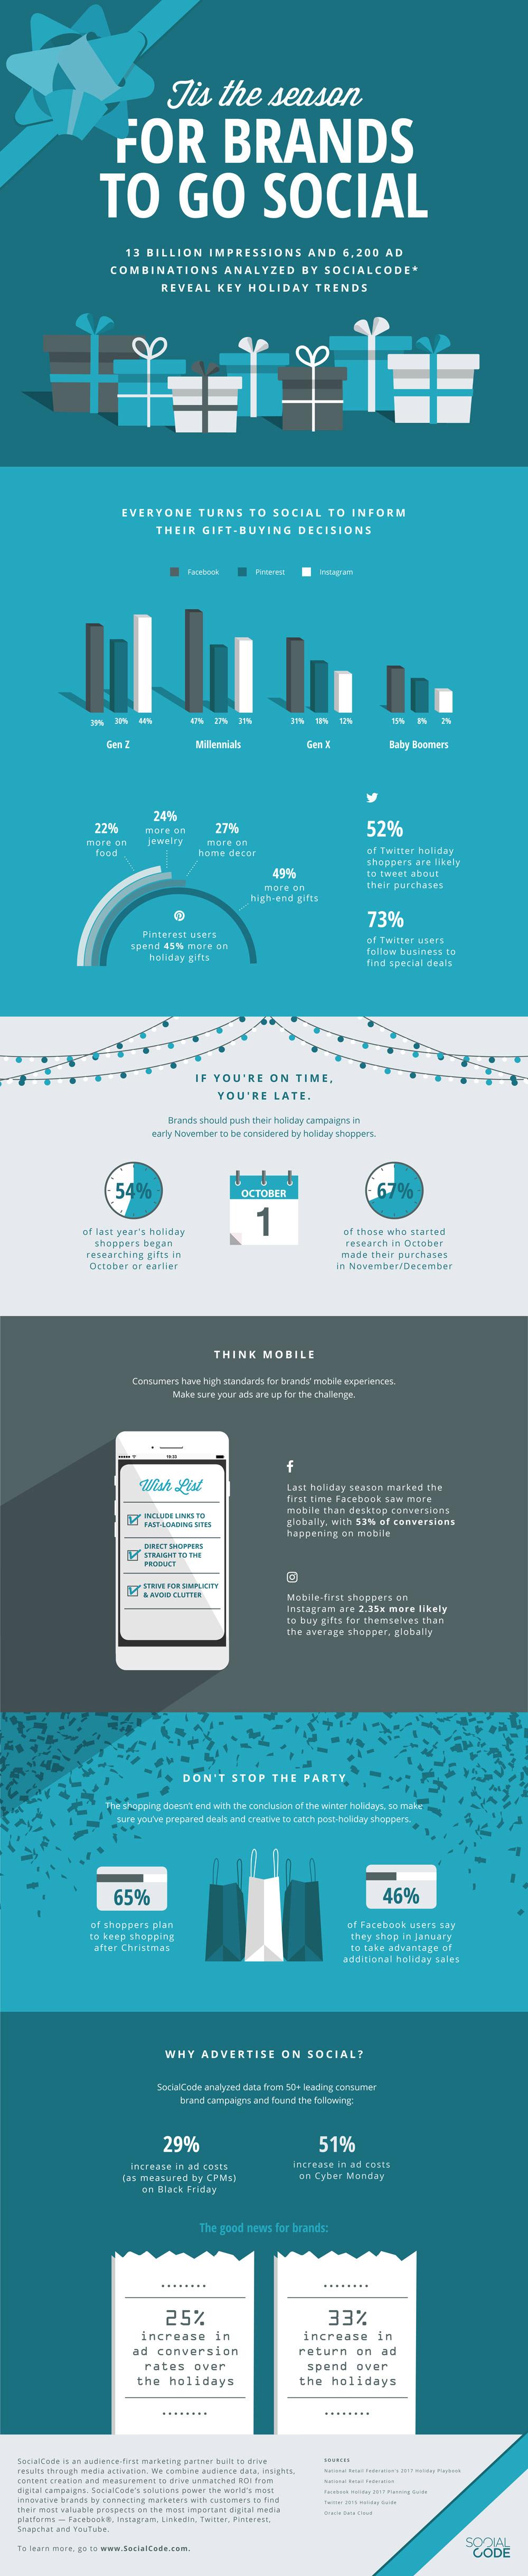 Holiday-Stats-Infographic_V4.jpg